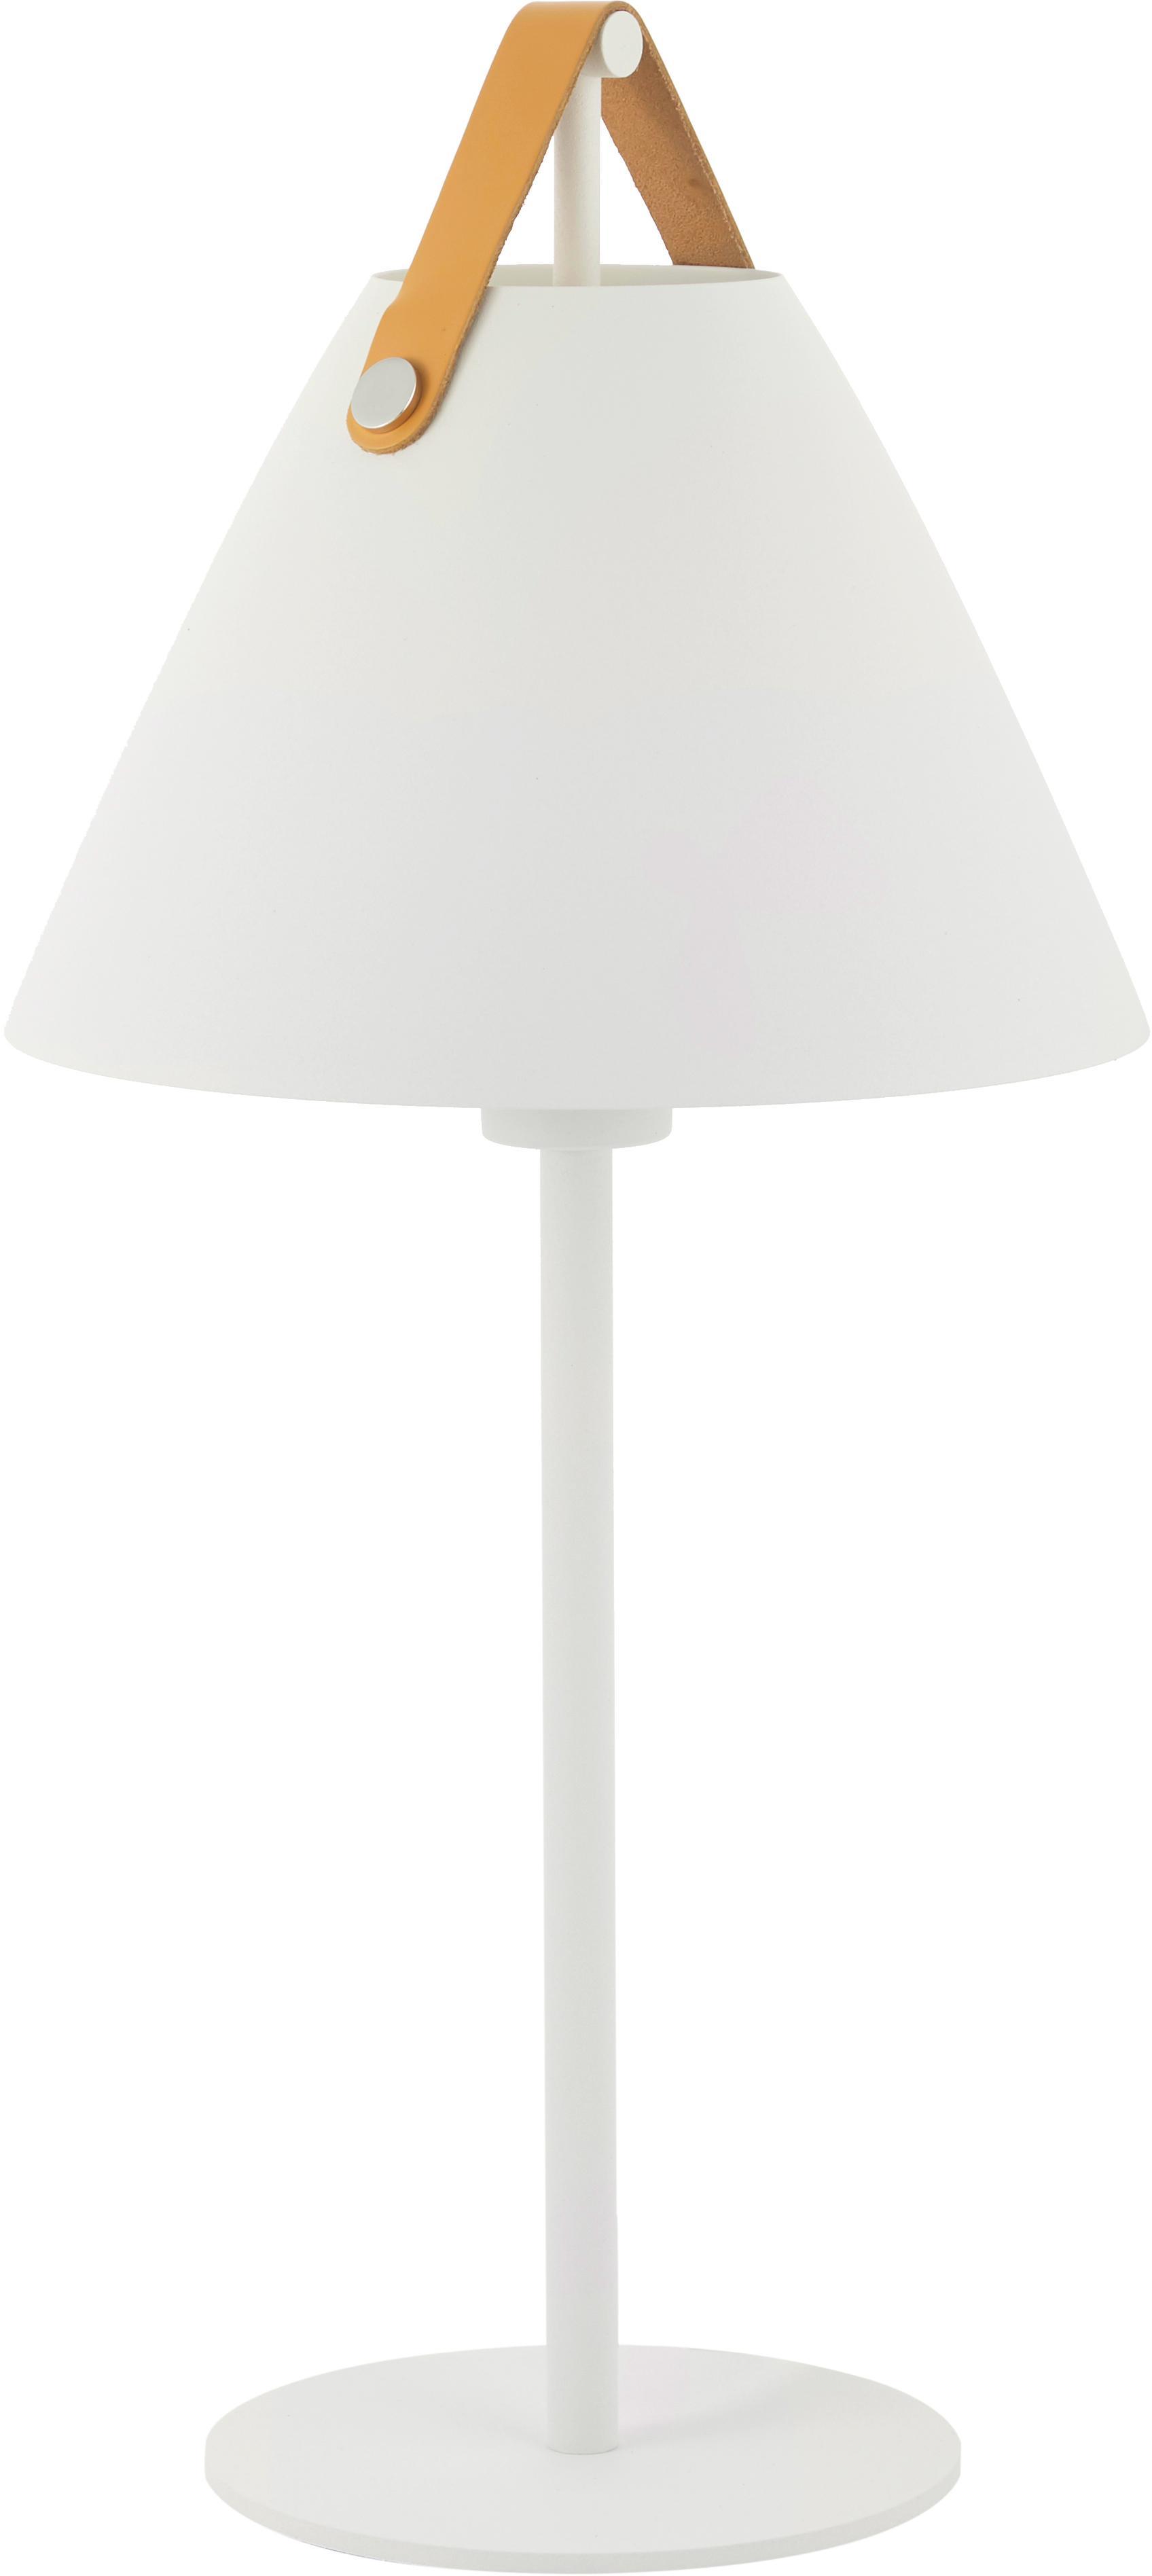 Scandi tafellamp Strap, Wit, Ø 25 x H 55 cm